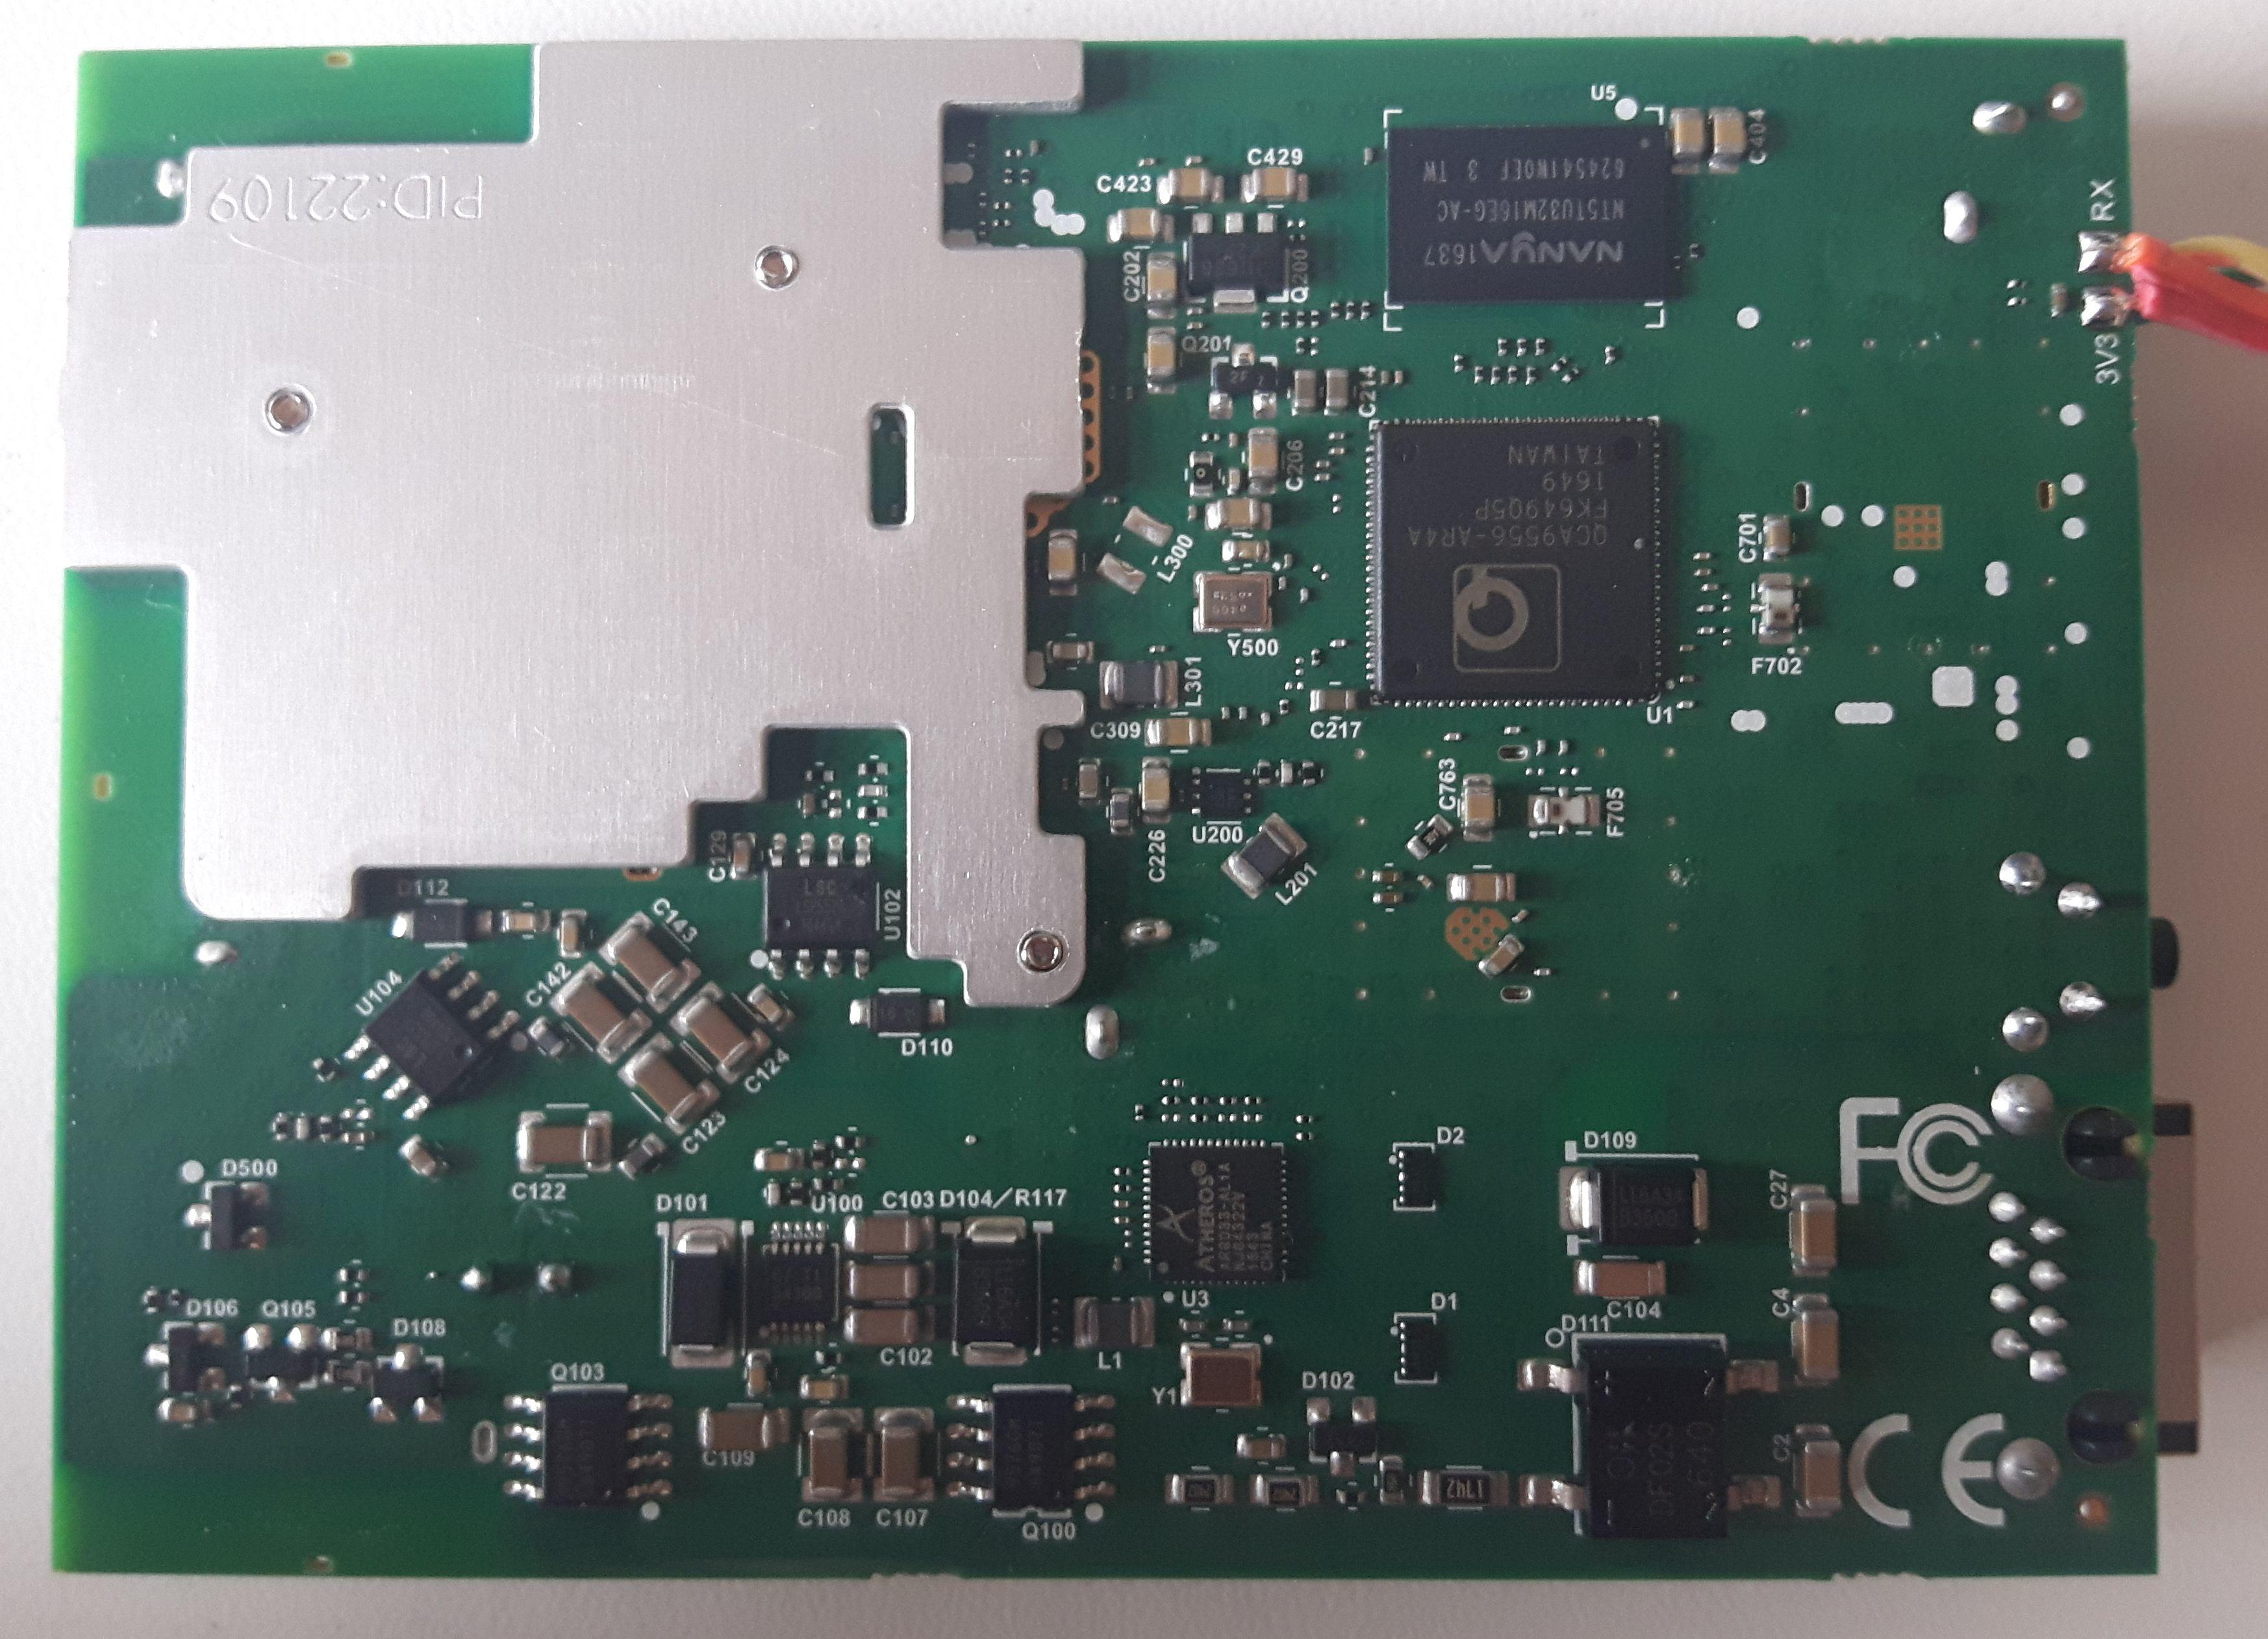 Ar71xx-mikrotik: Mikrotik wAP ac support - For Developers